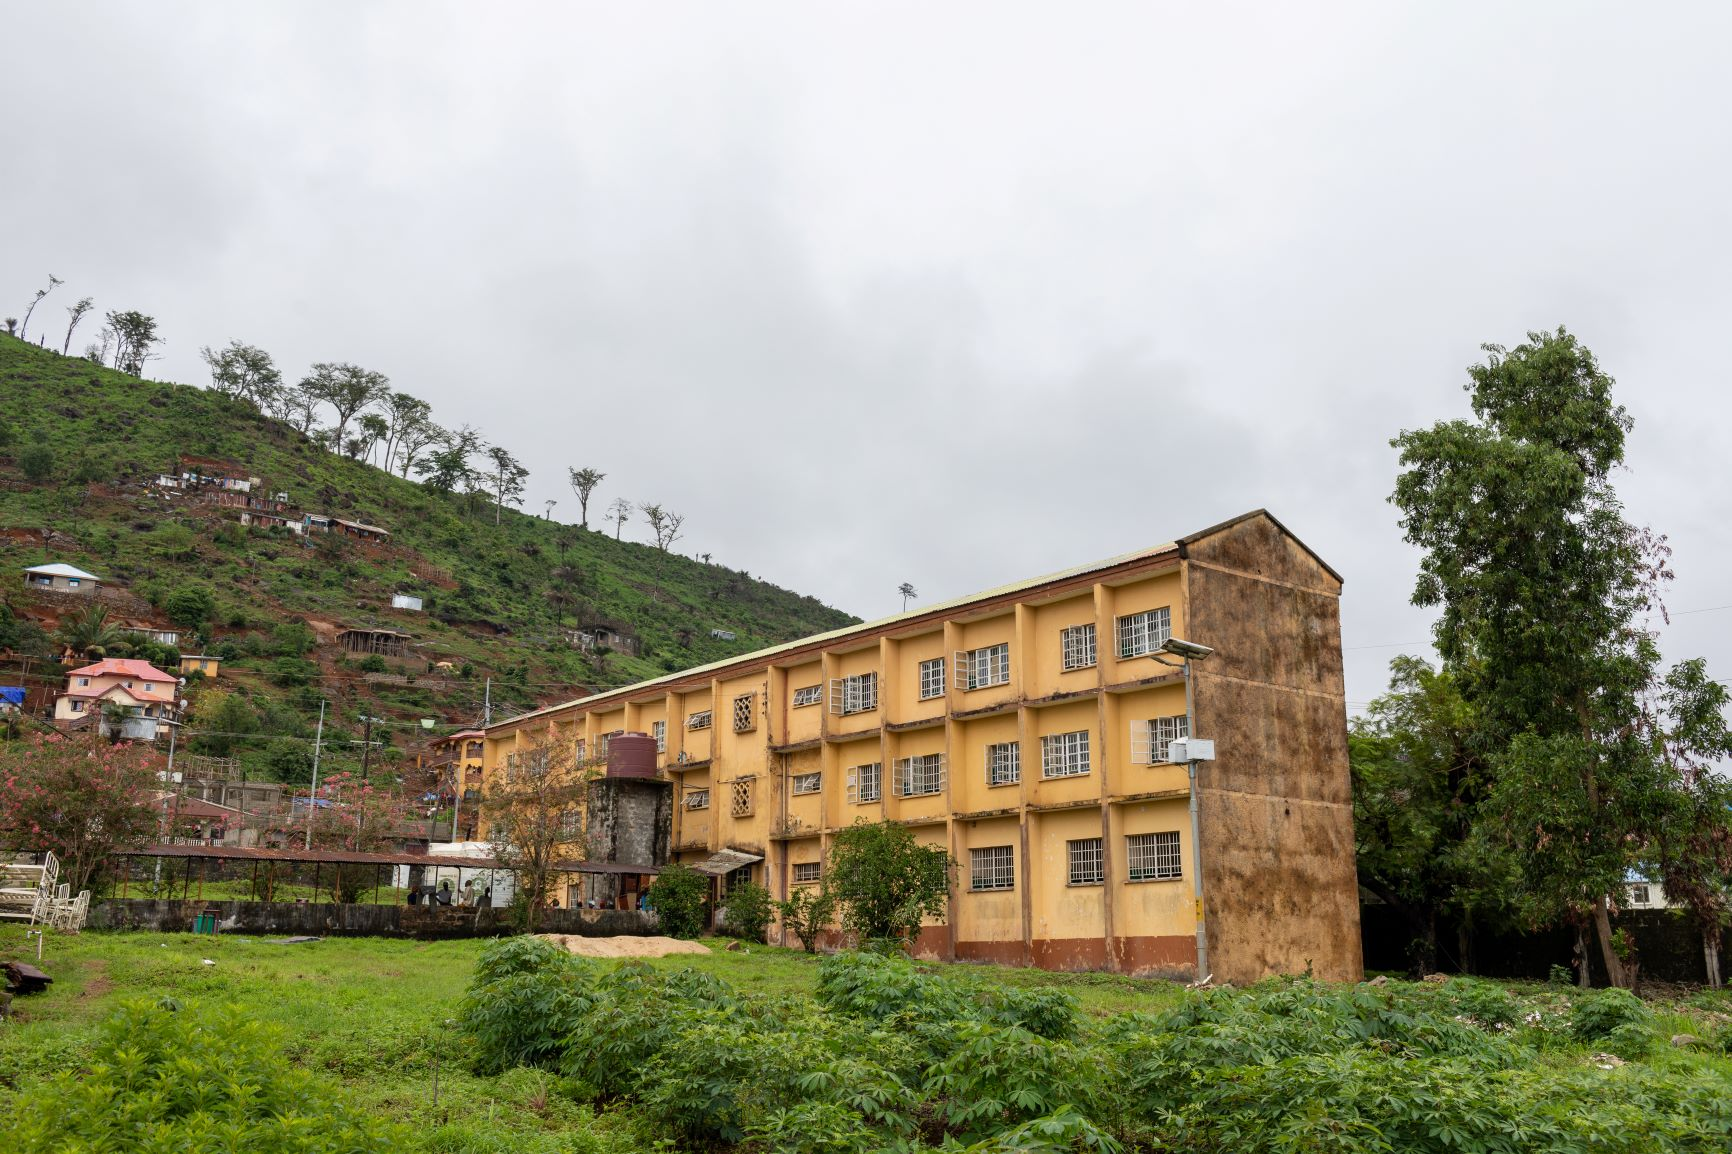 Outdoor shot of Lakka Hospital and surrounding area